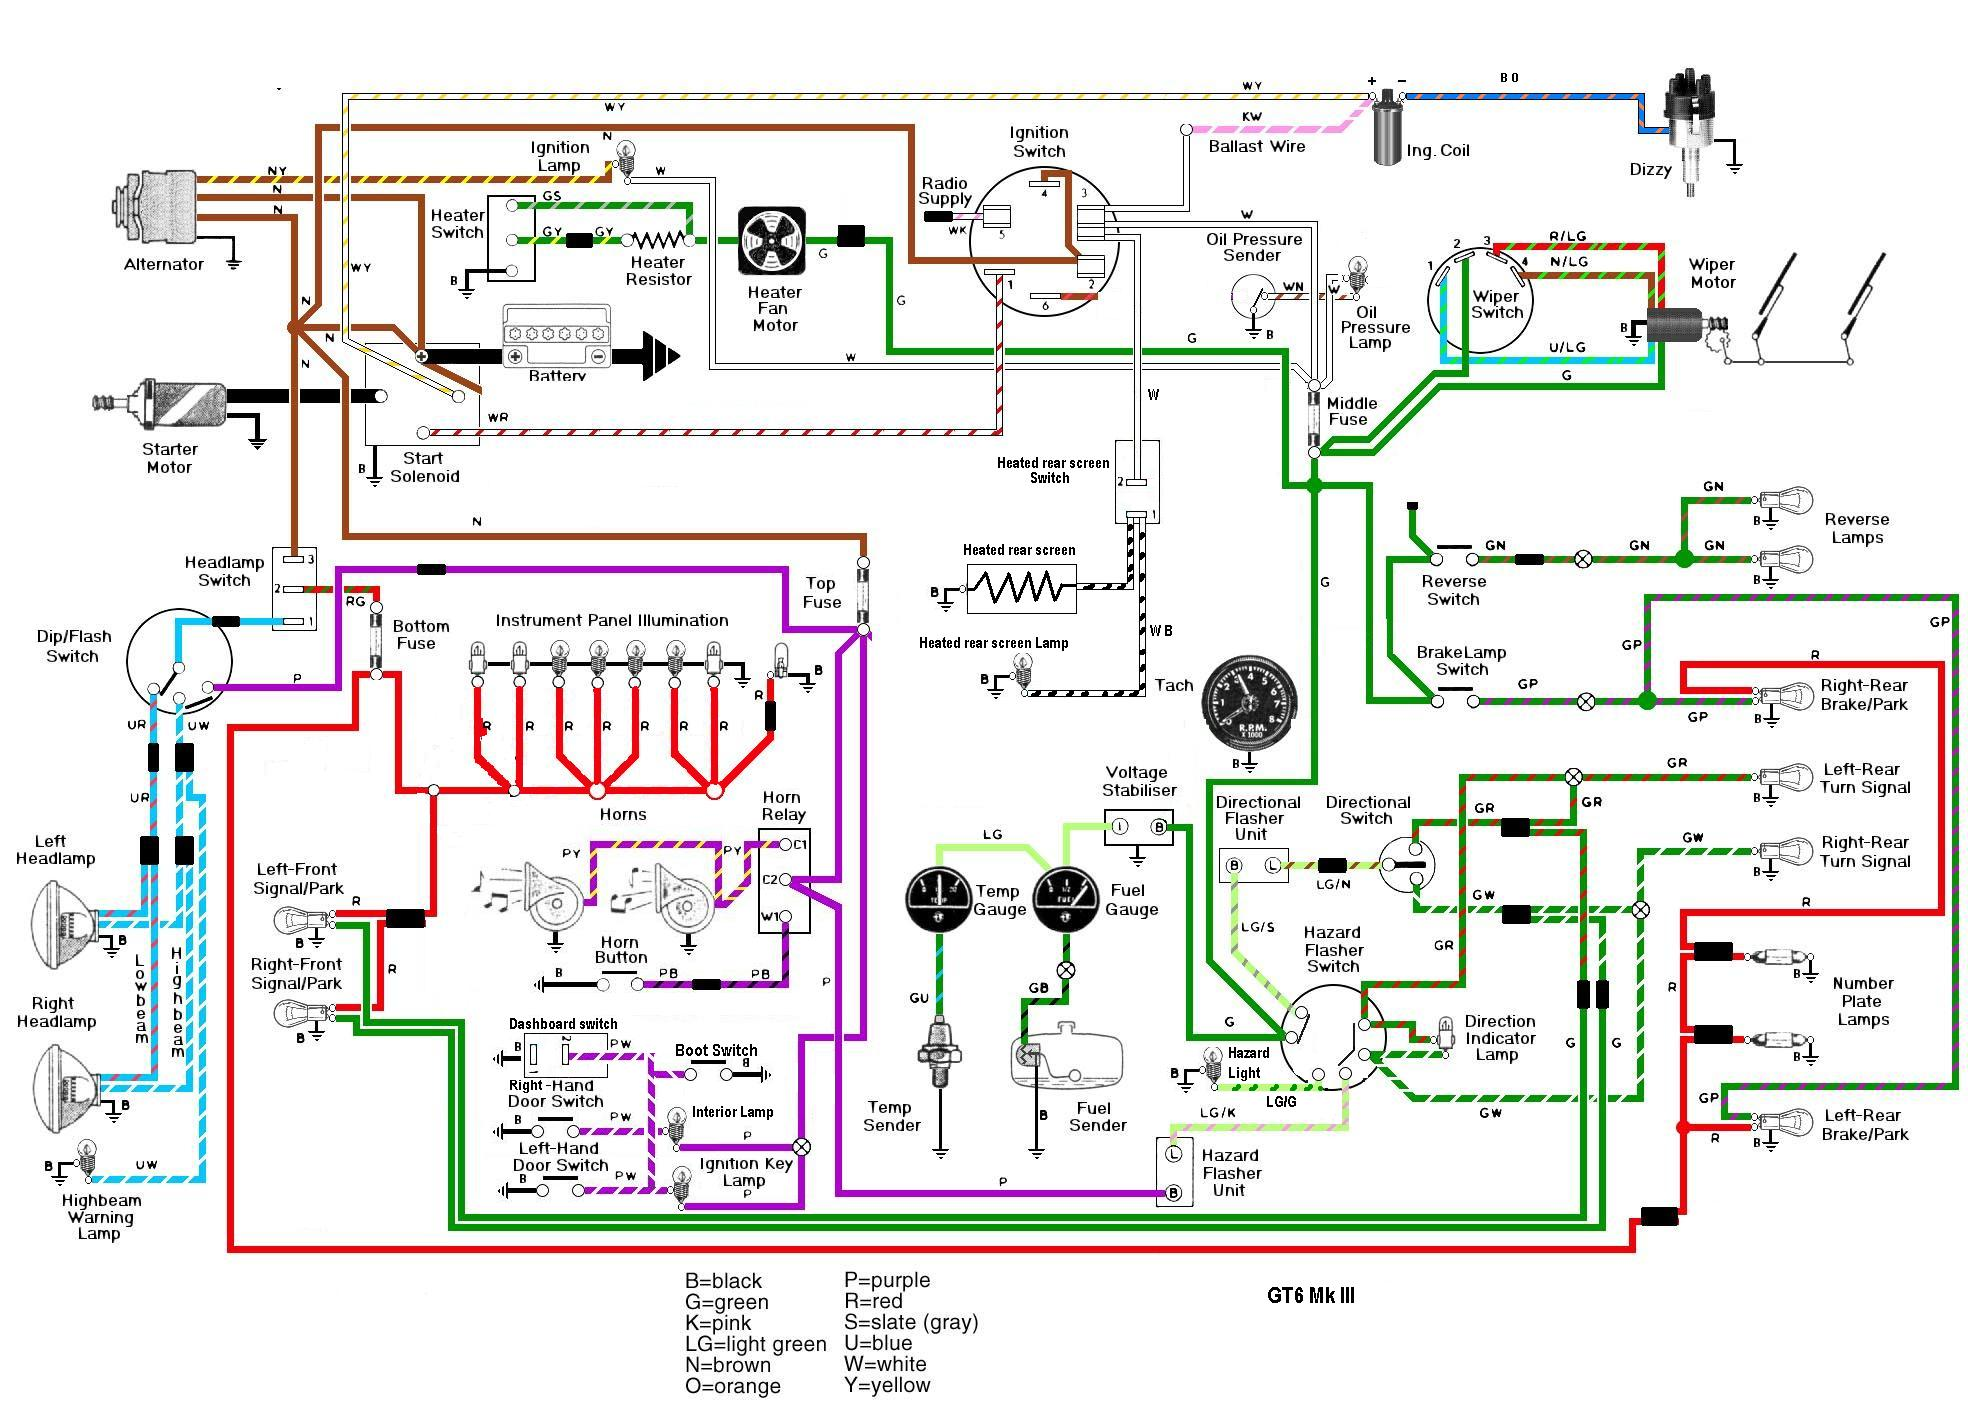 Phenomenal 1980 Mgb Wiring Schematic Basic Electronics Wiring Diagram Wiring Cloud Picalendutblikvittorg